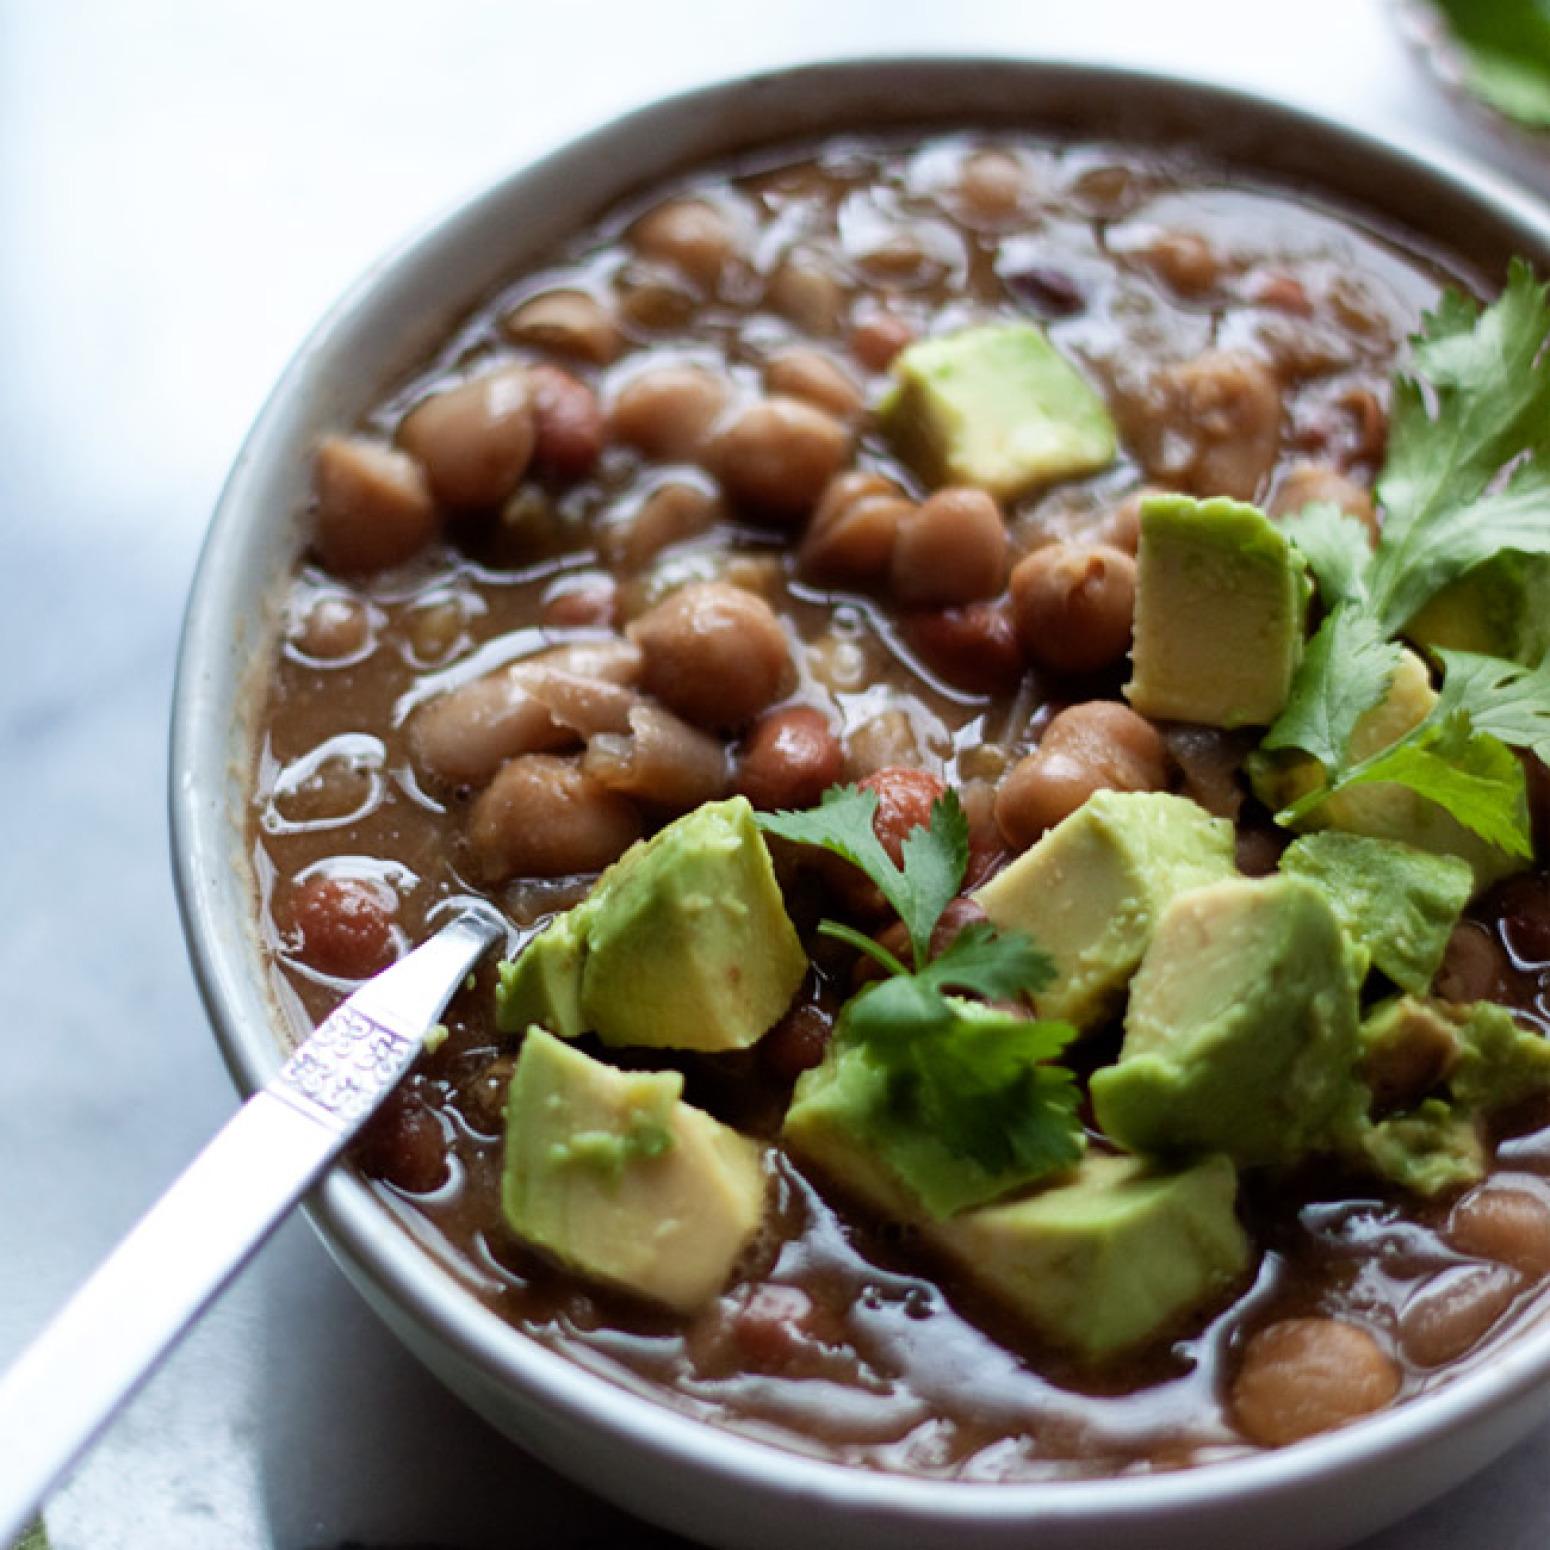 Hearty Three Bean White Chili Recipe | Just A Pinch Recipes